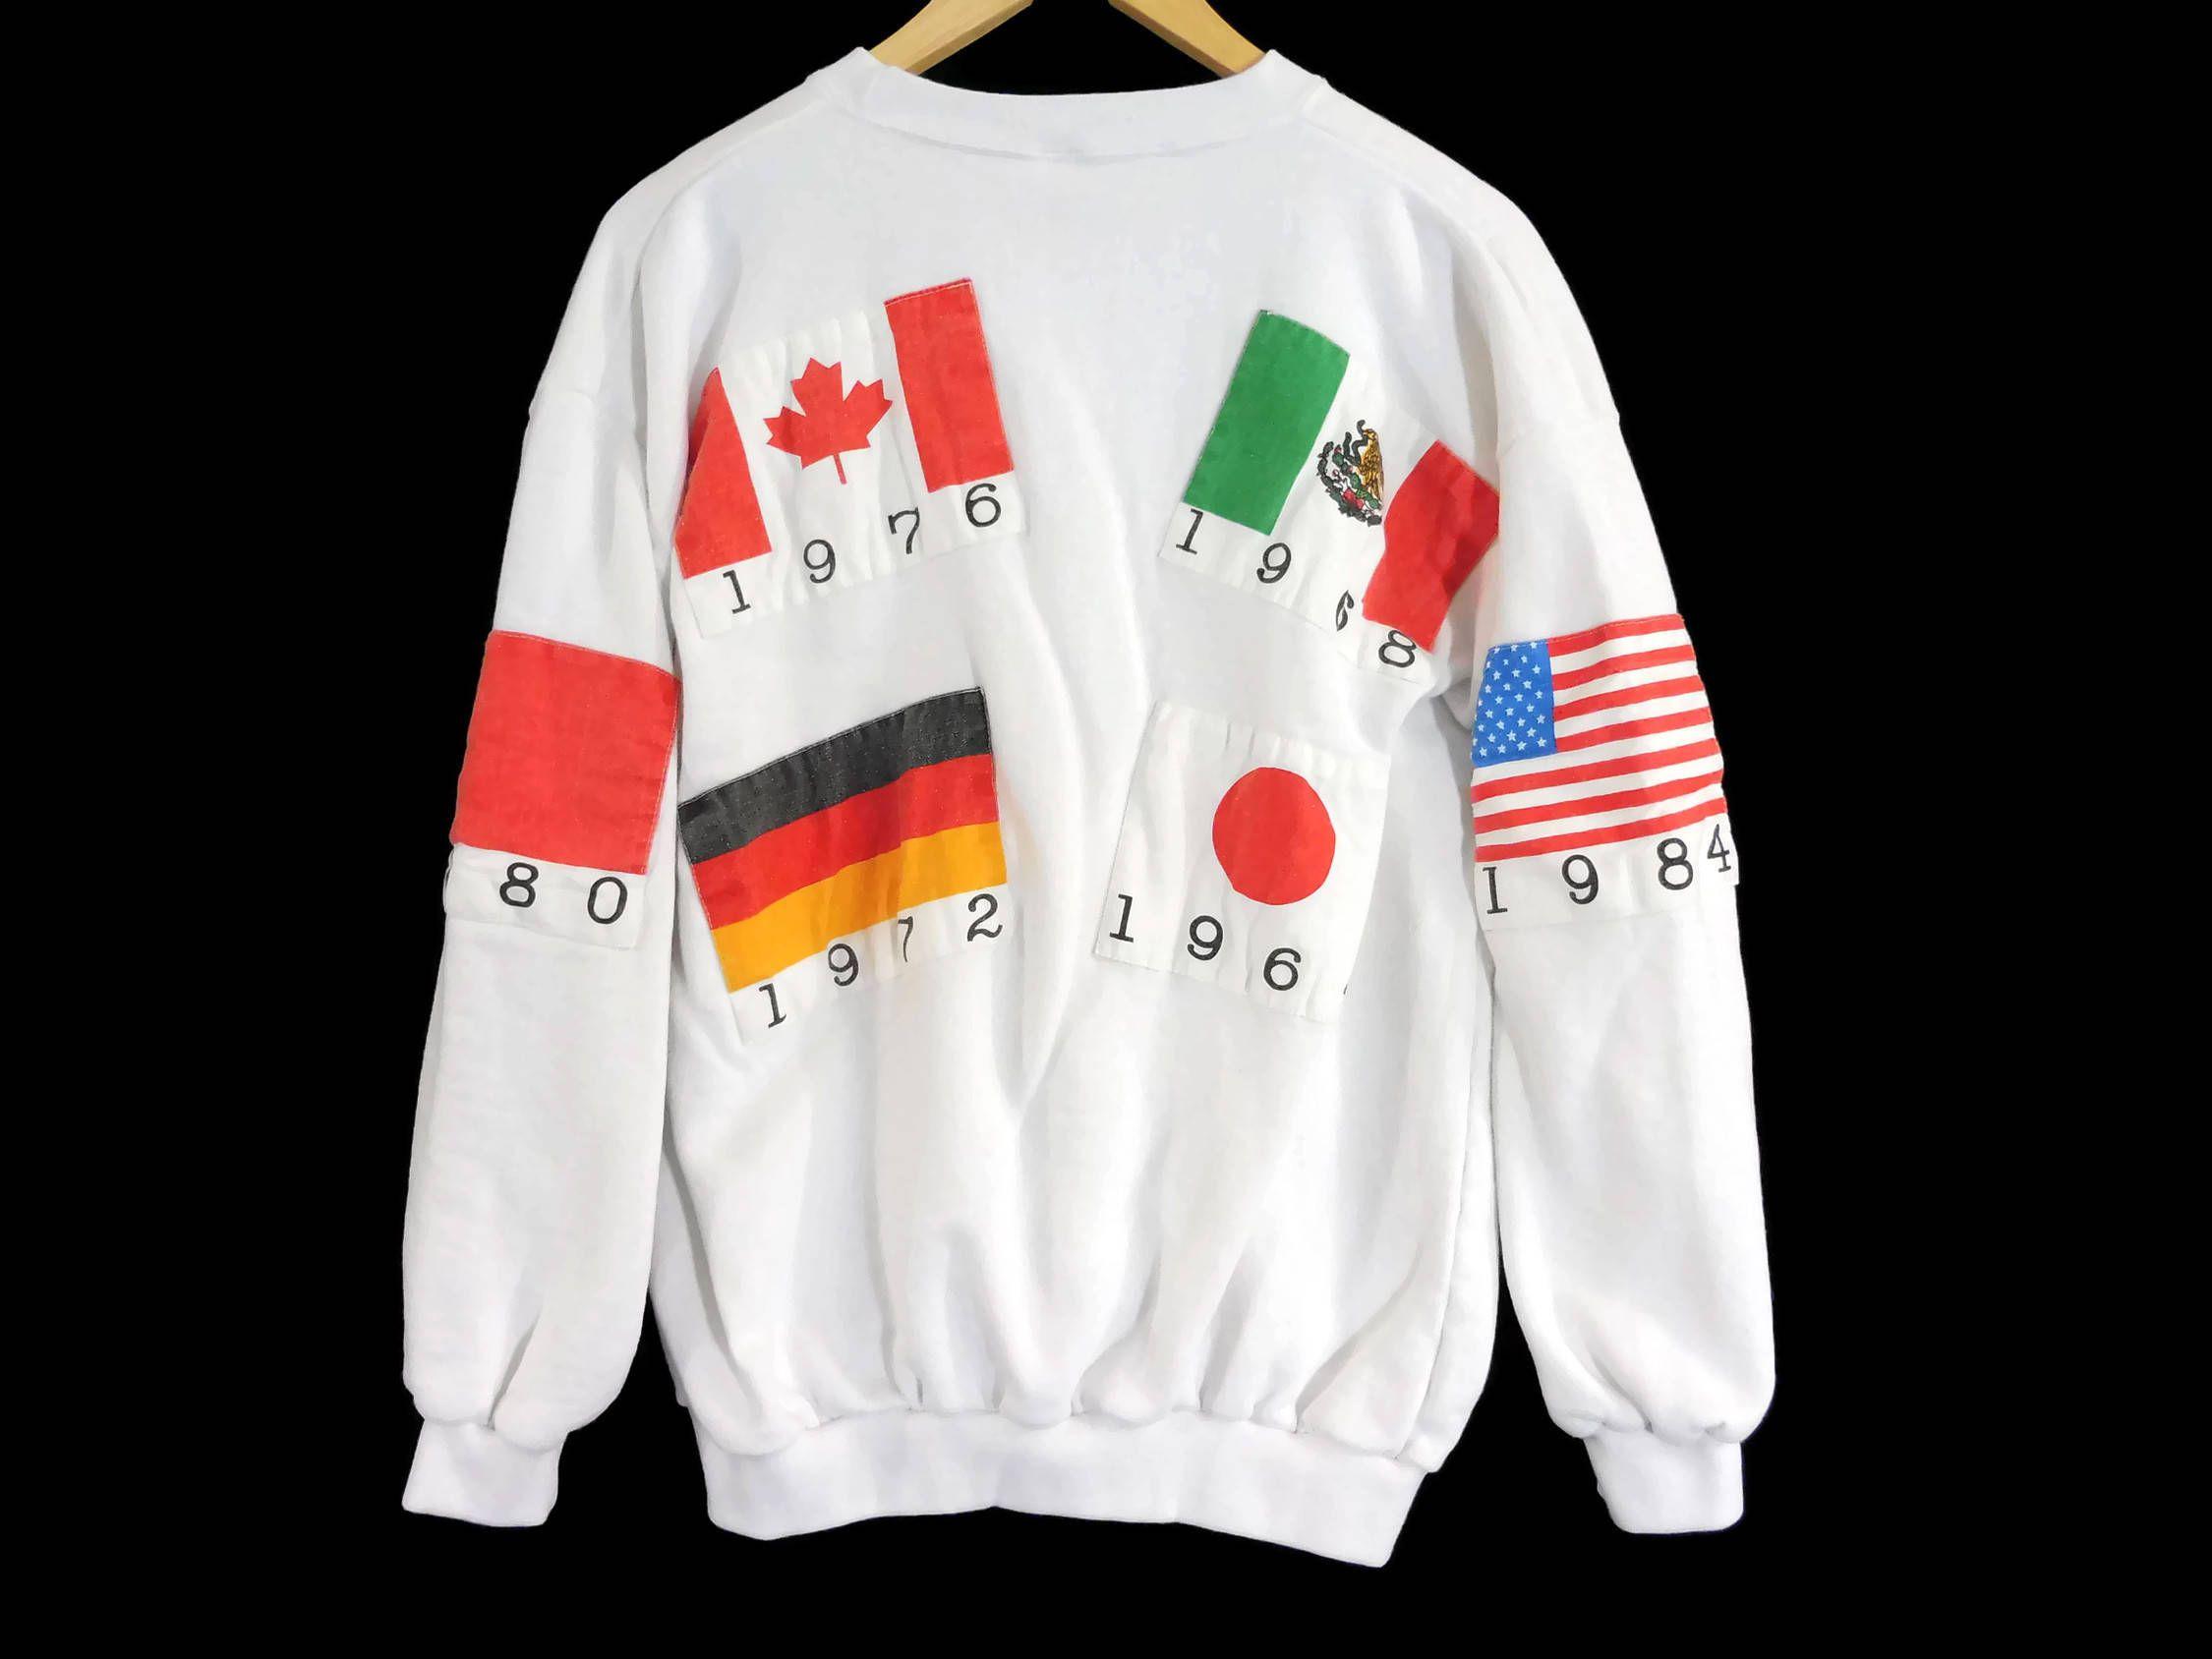 Vintage 1988 Olympics Crewneck Sweatshirt Large South Korea Seoul Olympics Olympic Clothing Vintage Vintage Outfits Sweatshirts Crew Neck Sweatshirt [ 1688 x 2250 Pixel ]